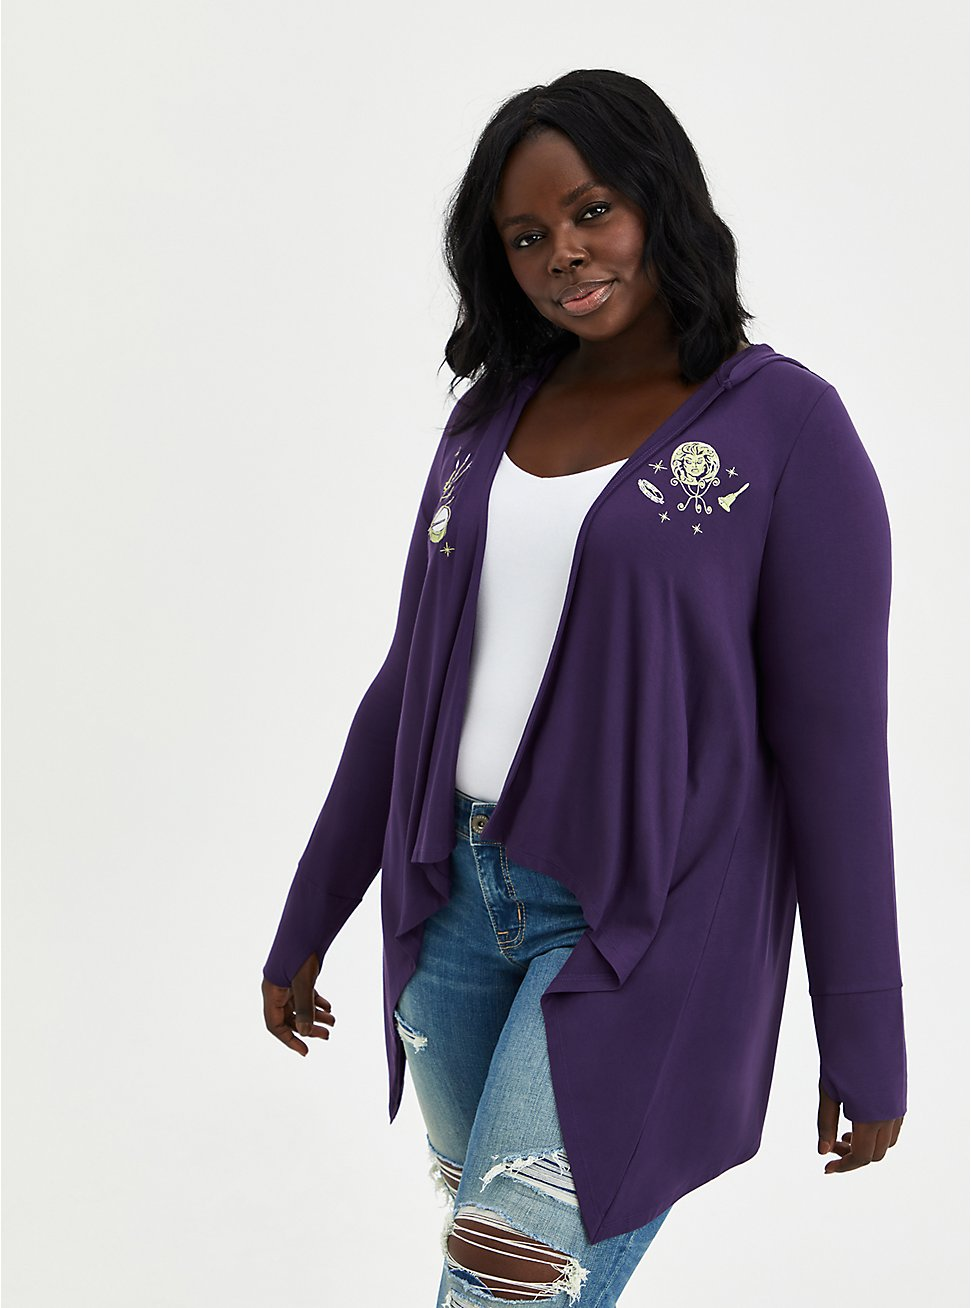 Disney Haunted Mansion Drape Cardigan - Super Soft Leota Purple, PURPLE, hi-res